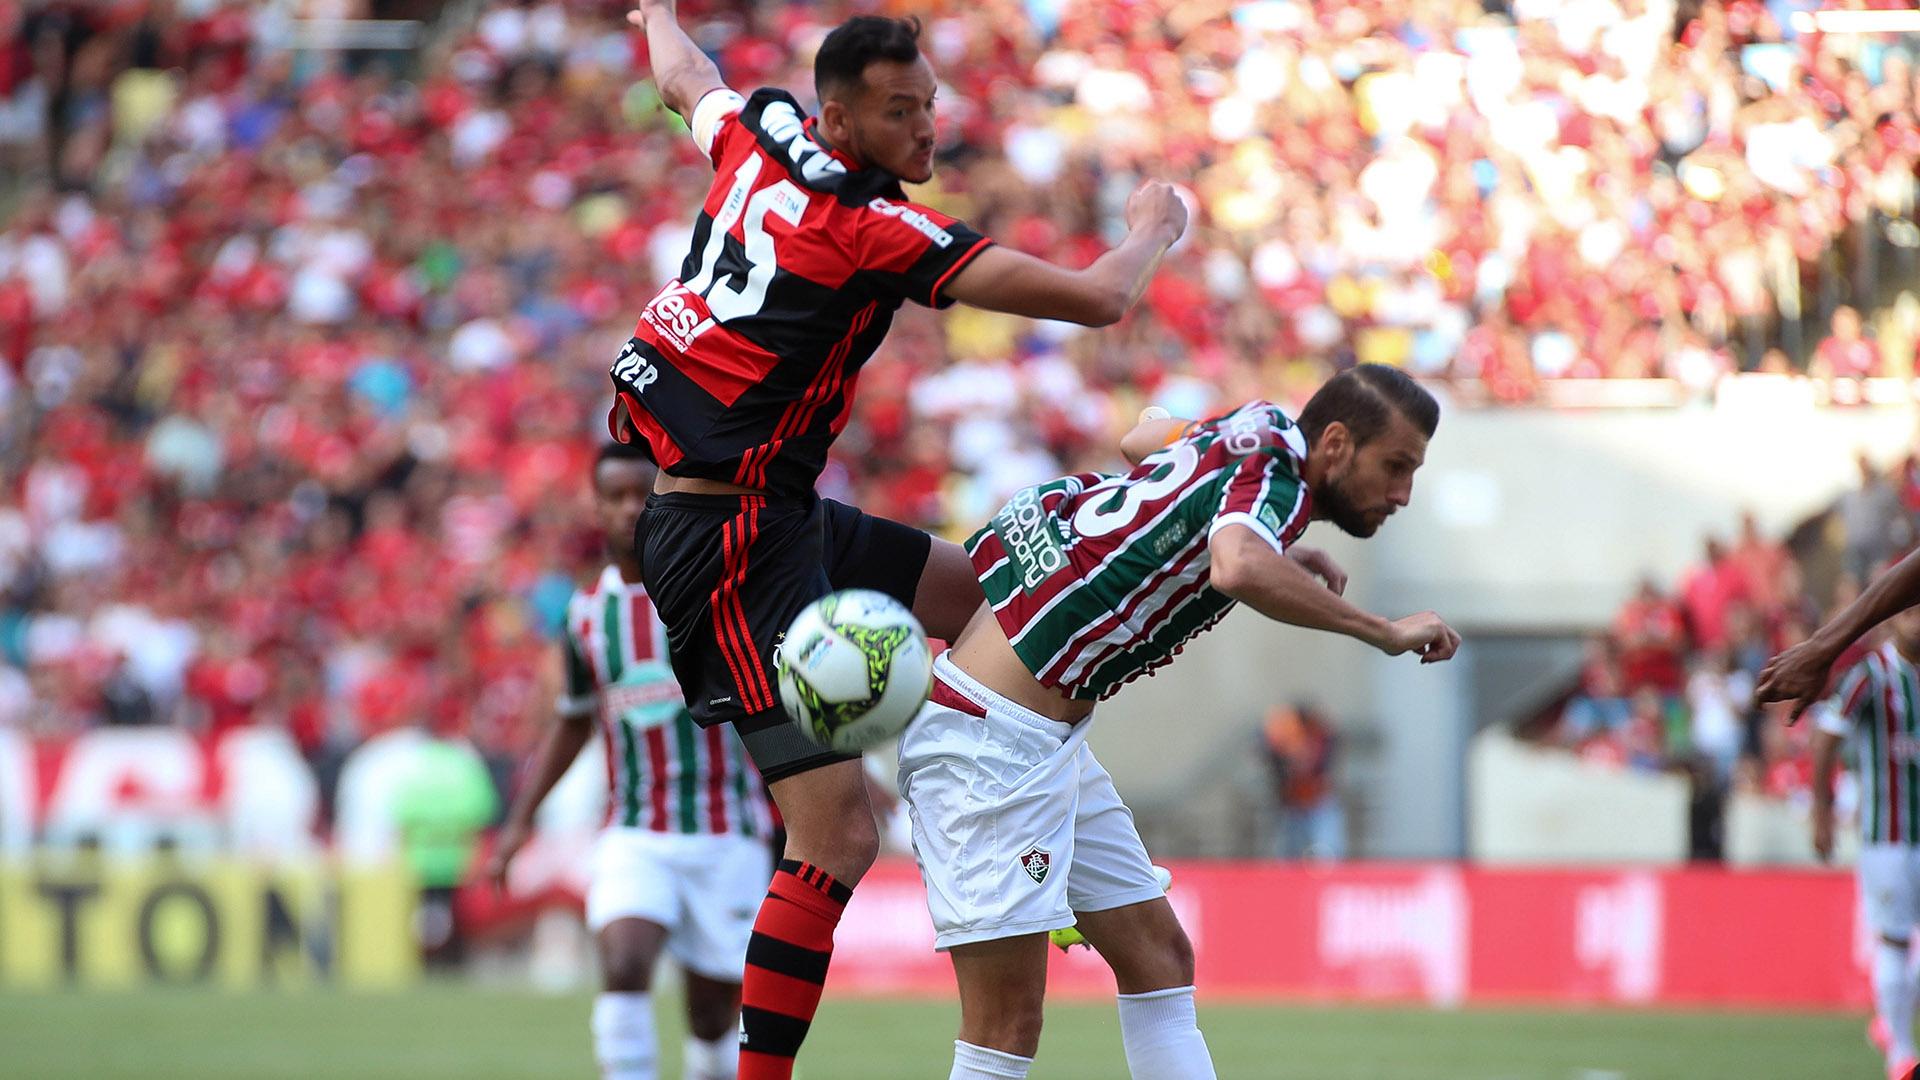 Rever Henrique Fluminense Flamengo Carioca 30042017